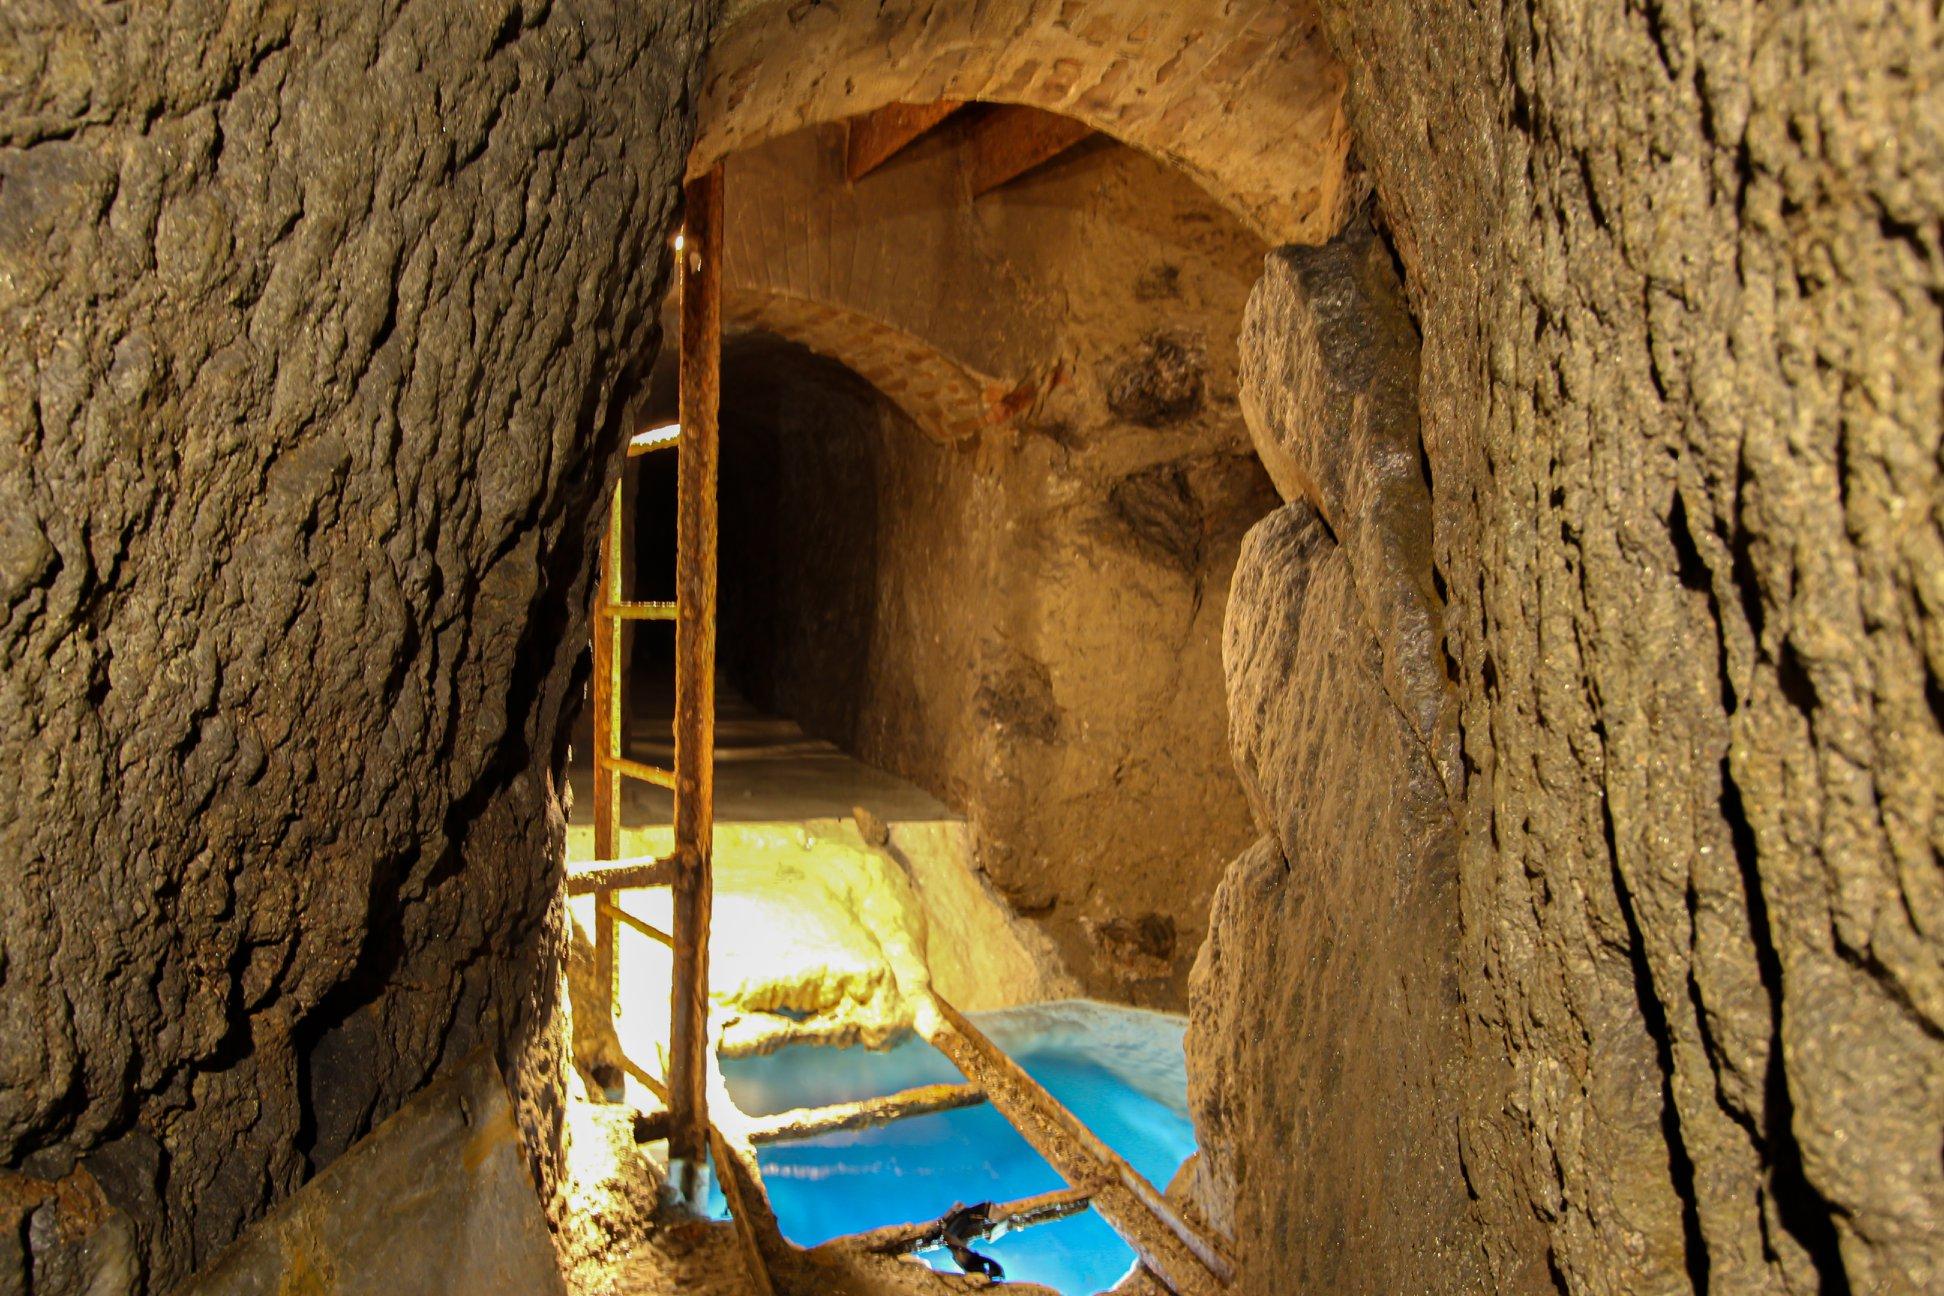 souterrain lyon urban exploration